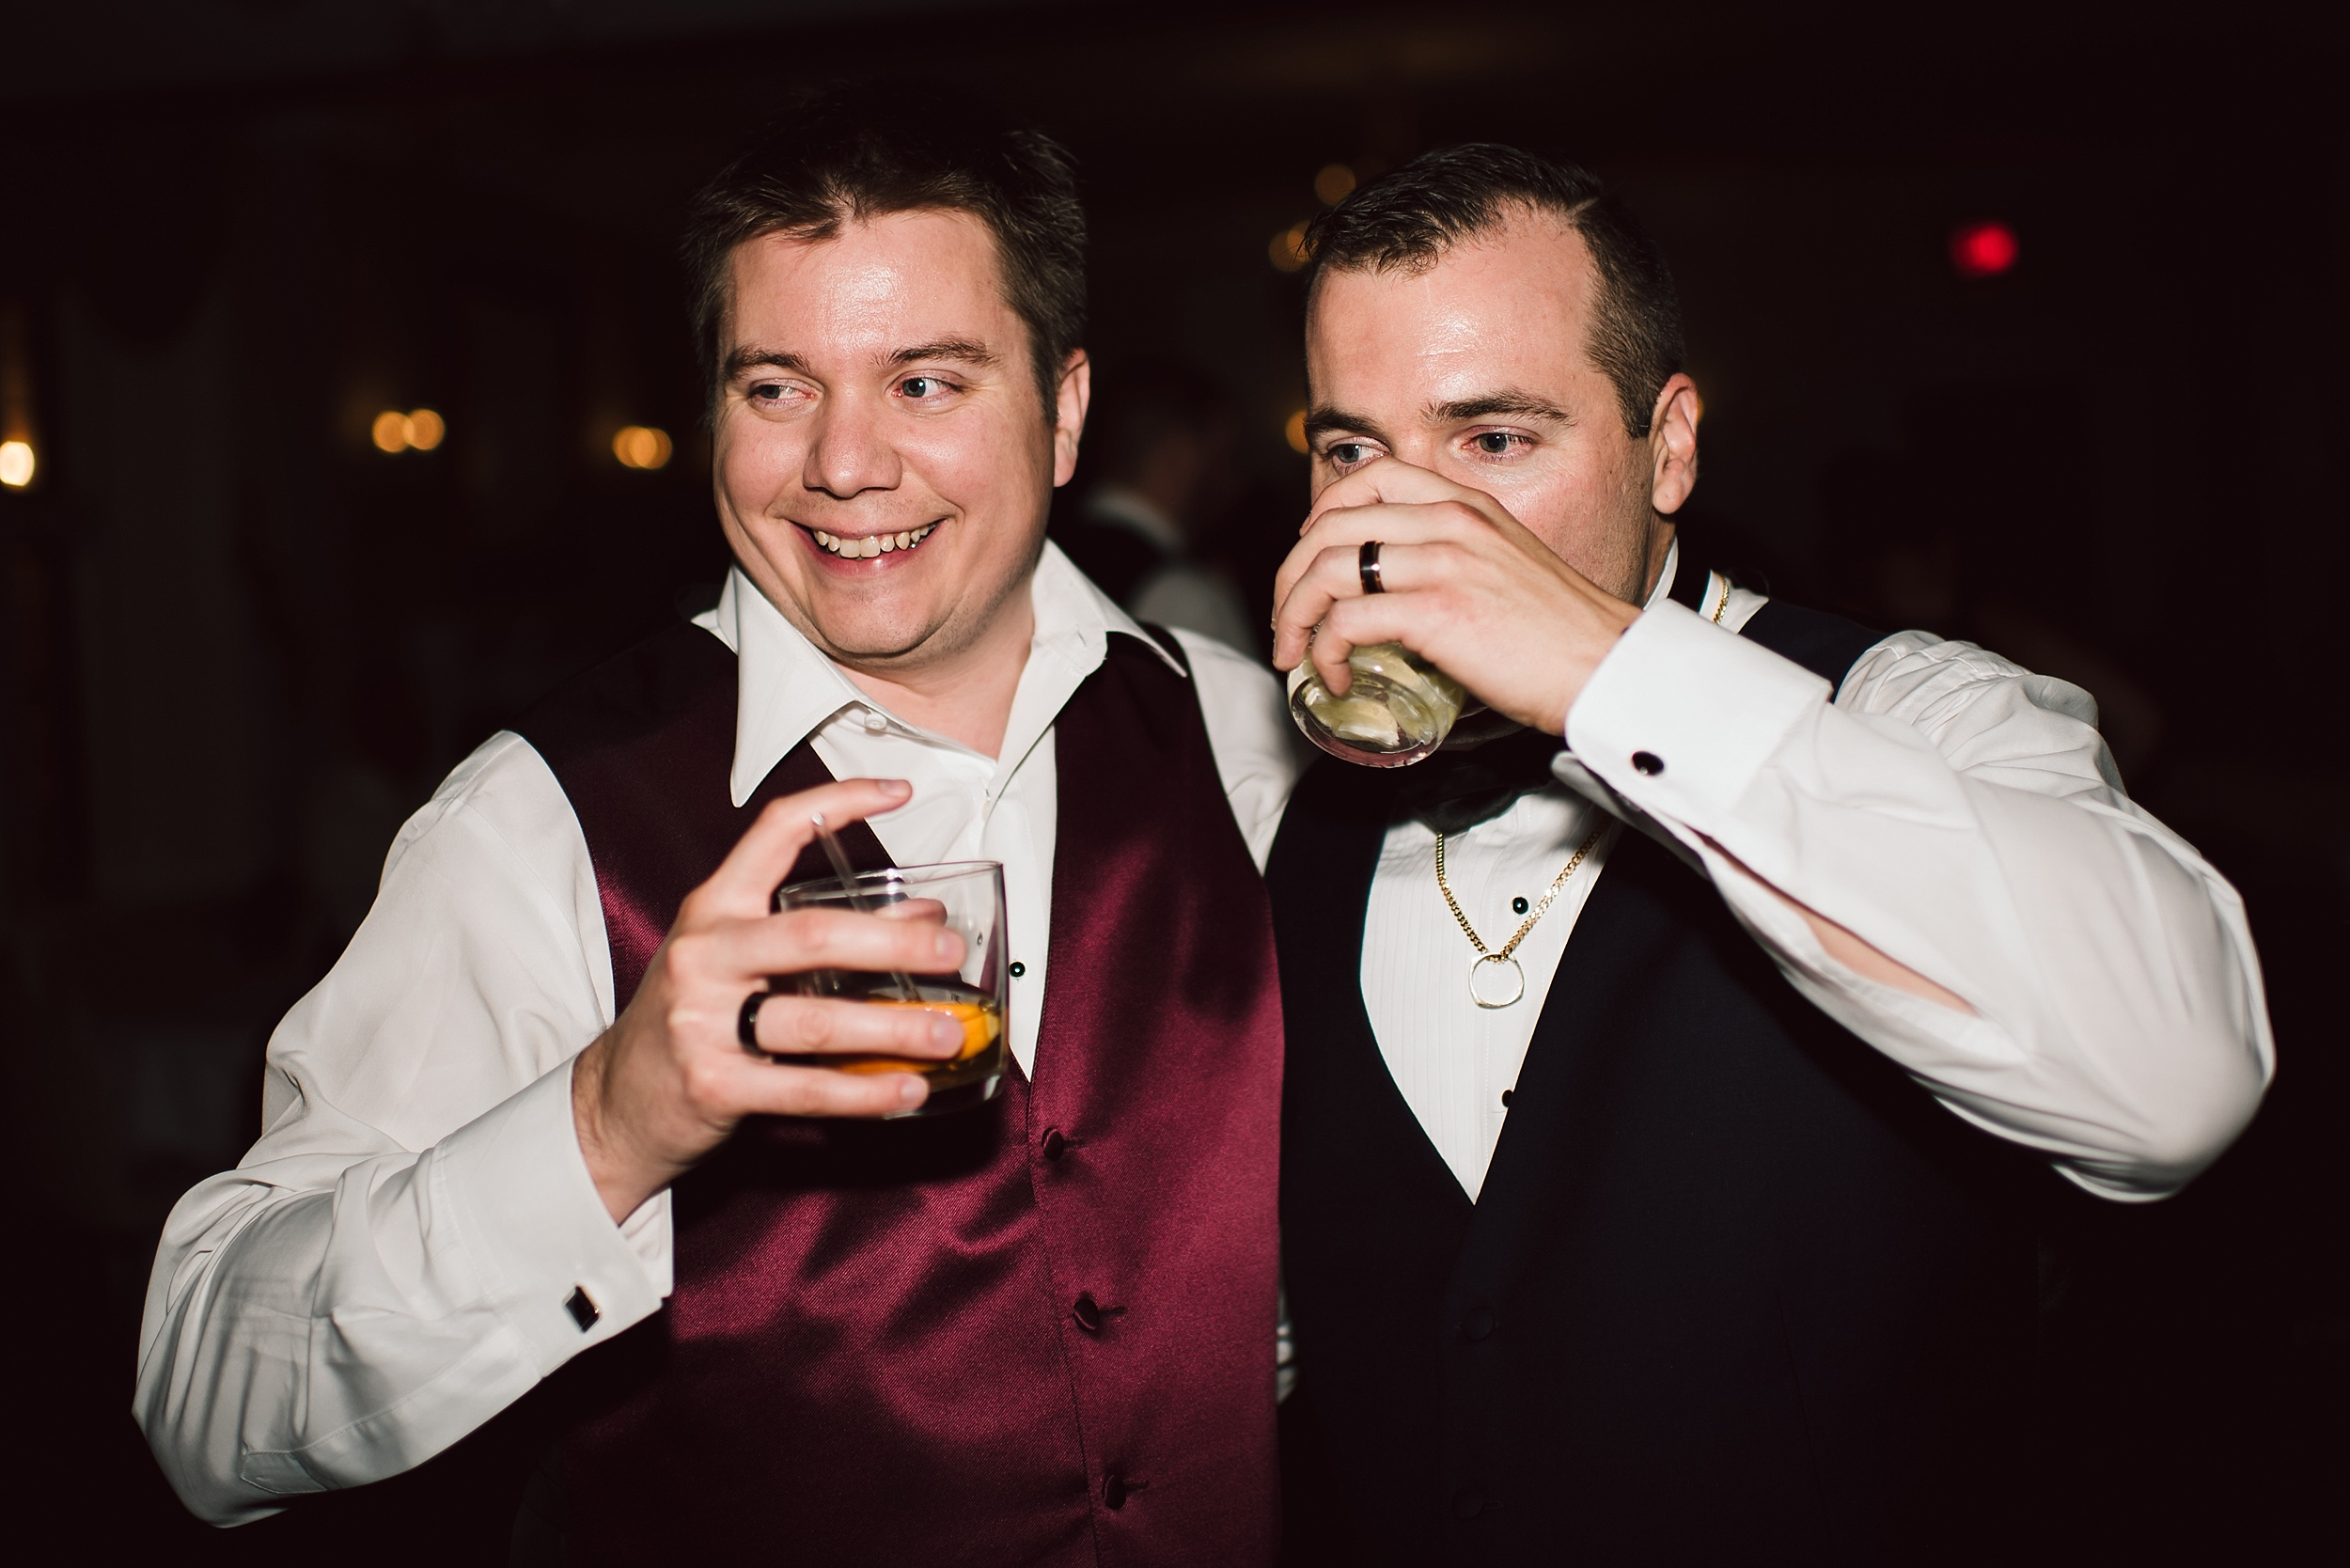 Sunnybrook_Estates_Alexander_Muir_Toronto_Wedding_Photographer_0110.jpg